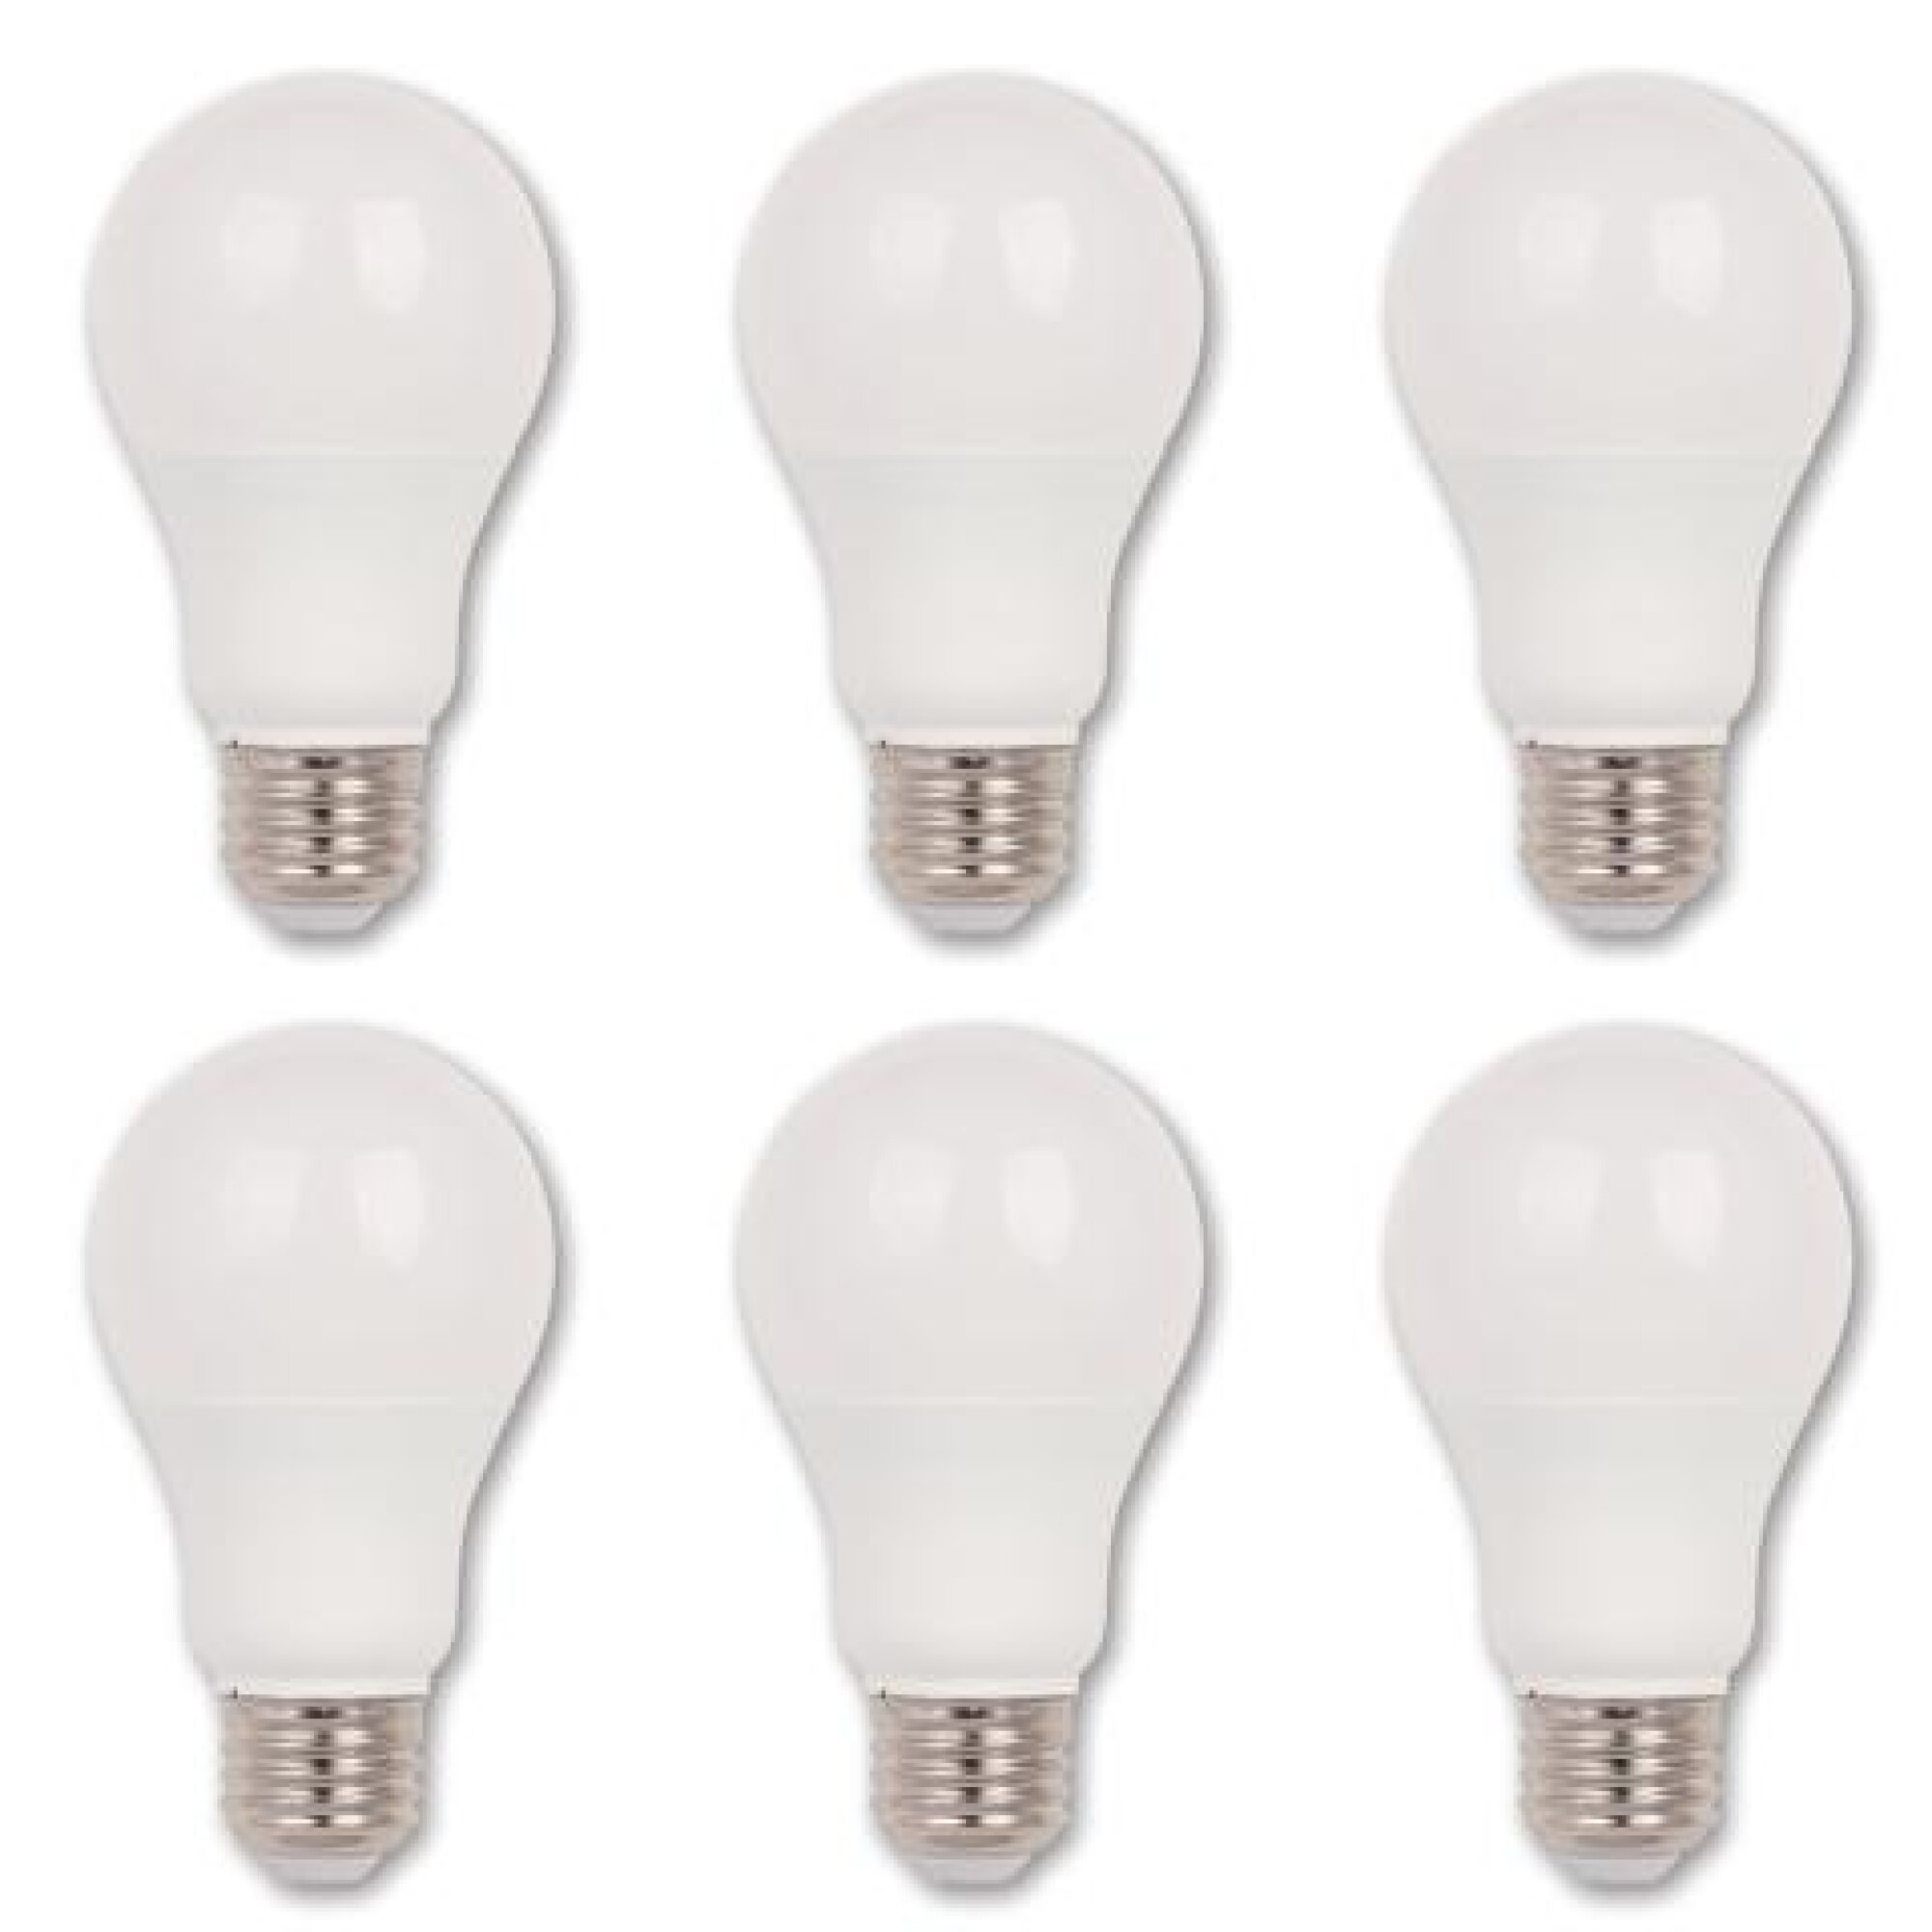 Westinghouse Lighting 11 Watt 75 Watt Equivalent A19 Led Dimmable Light Bulb Warm White 2700k E26 Medium Standard Base Wayfair